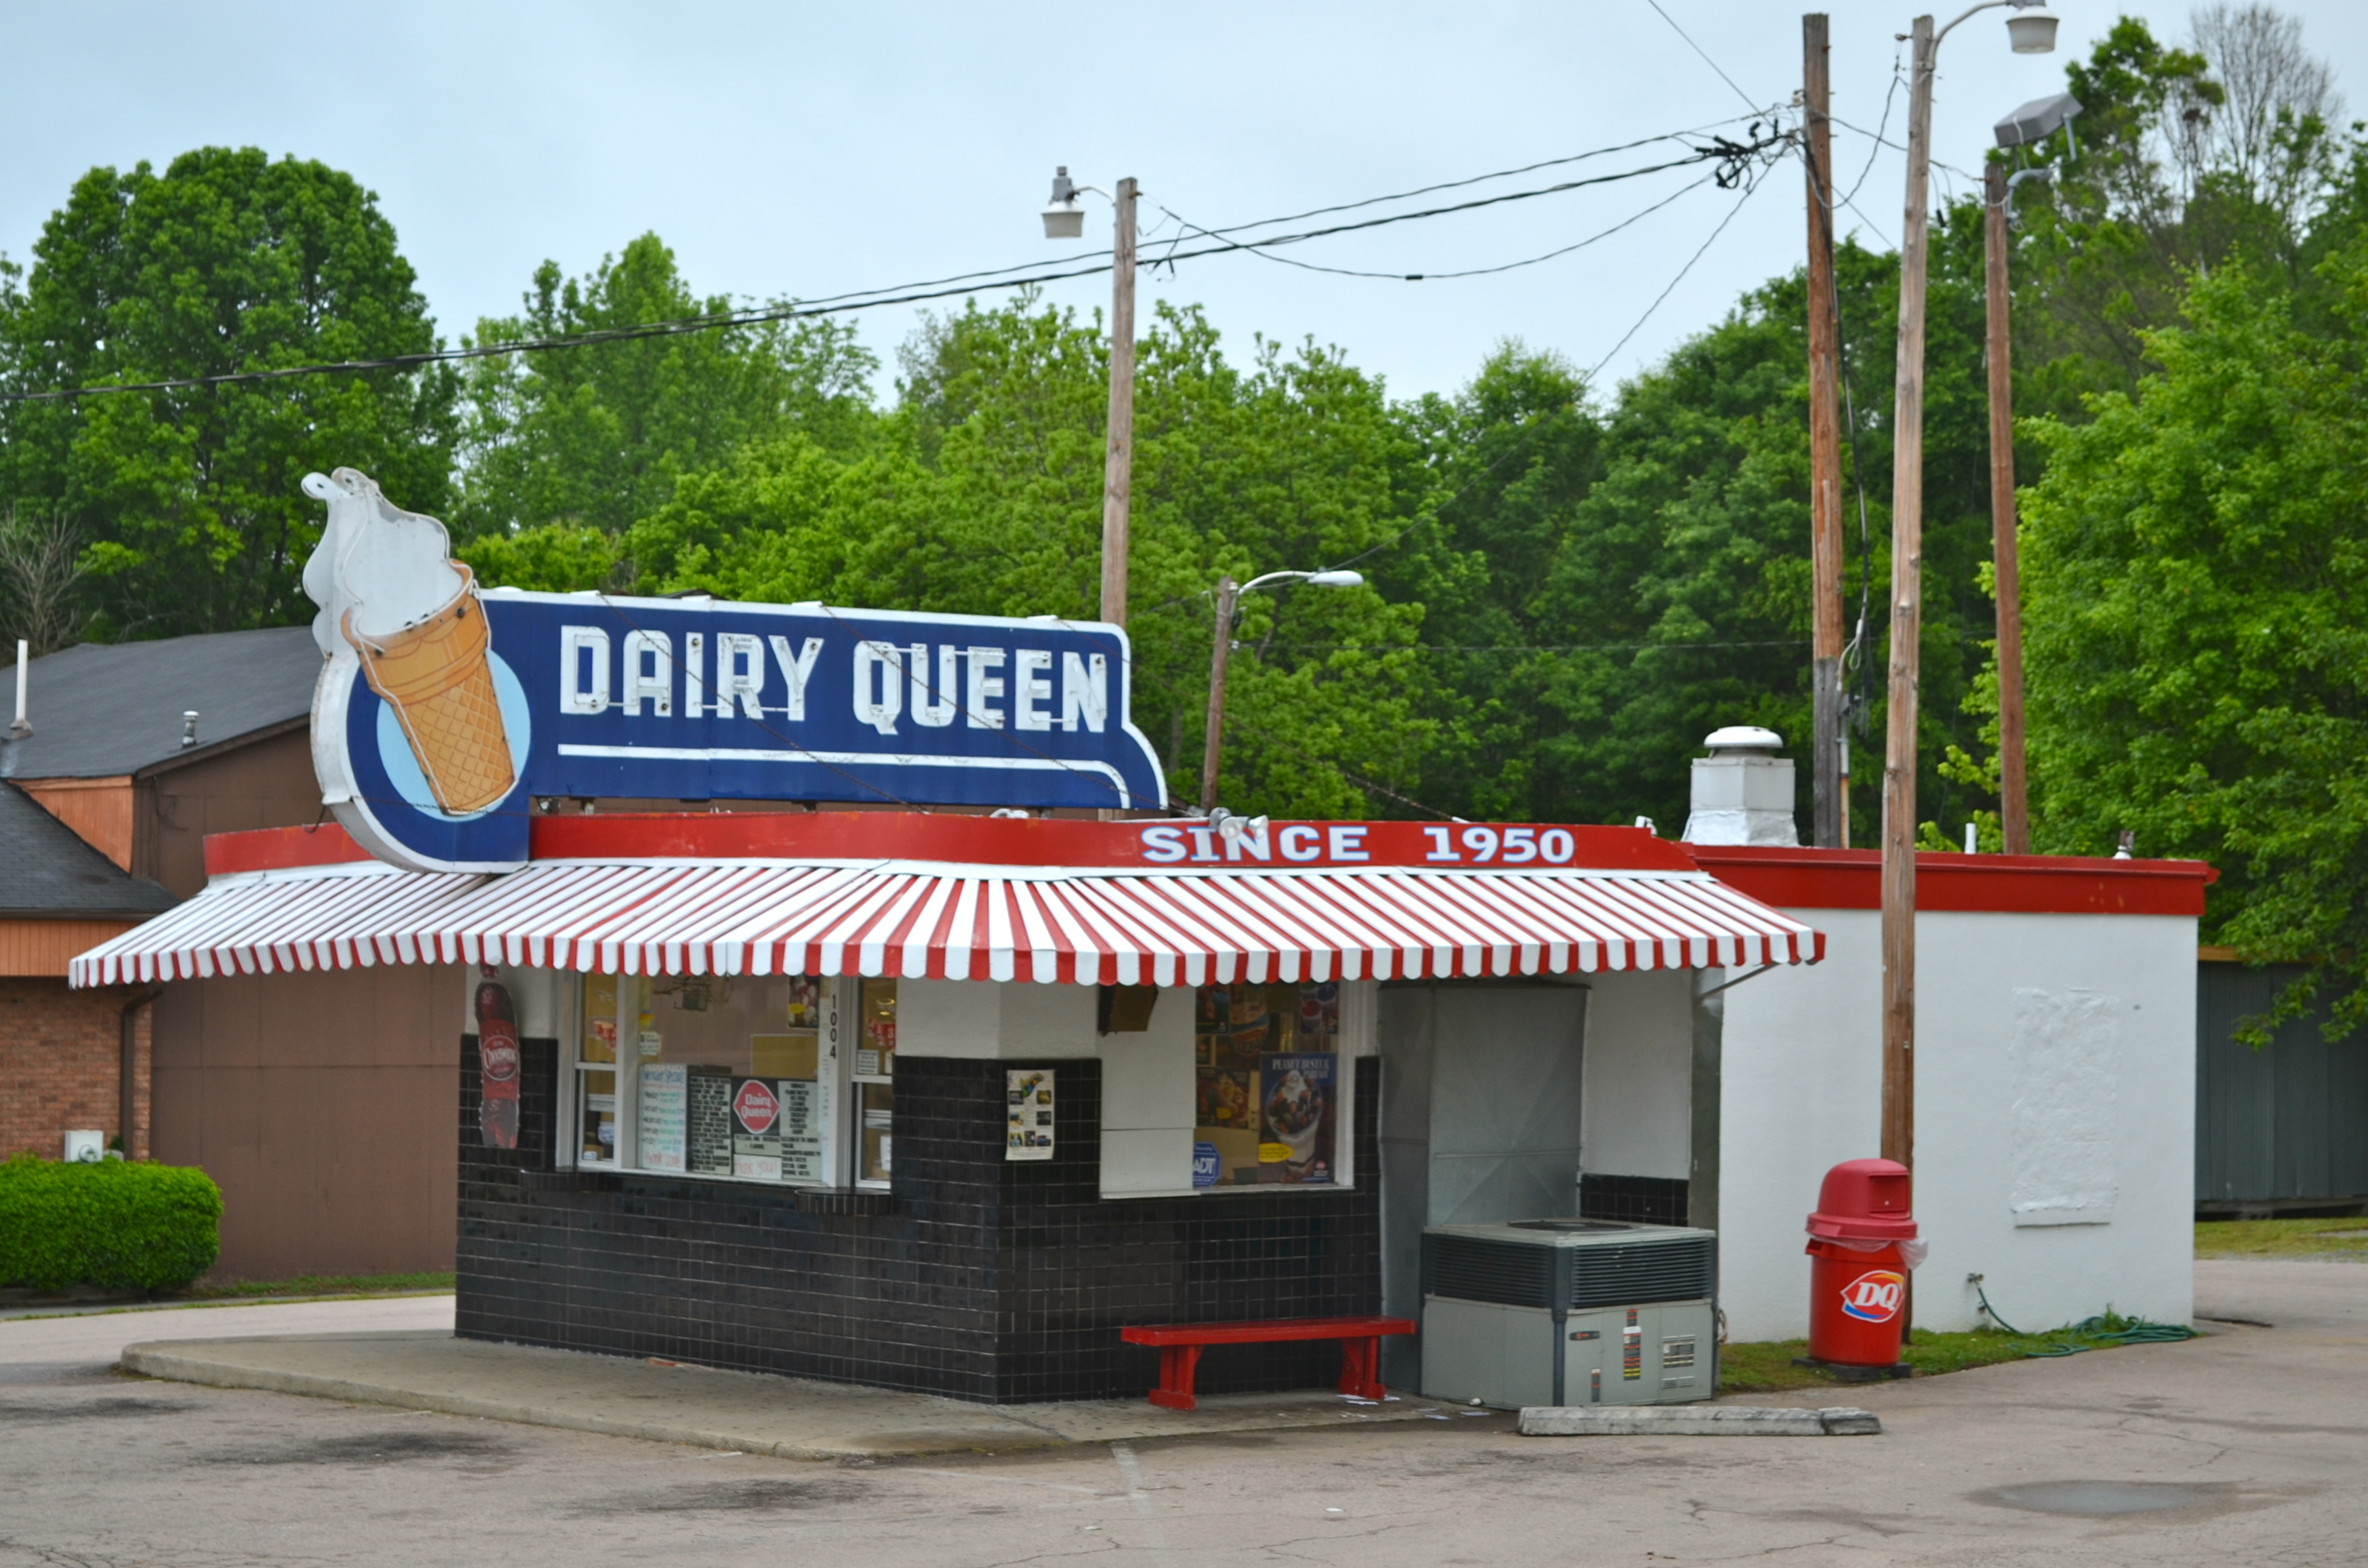 Dairy Queen - 1004 West Innes Street, Salisbury, North Carolina U.S.A. - May 10, 2015